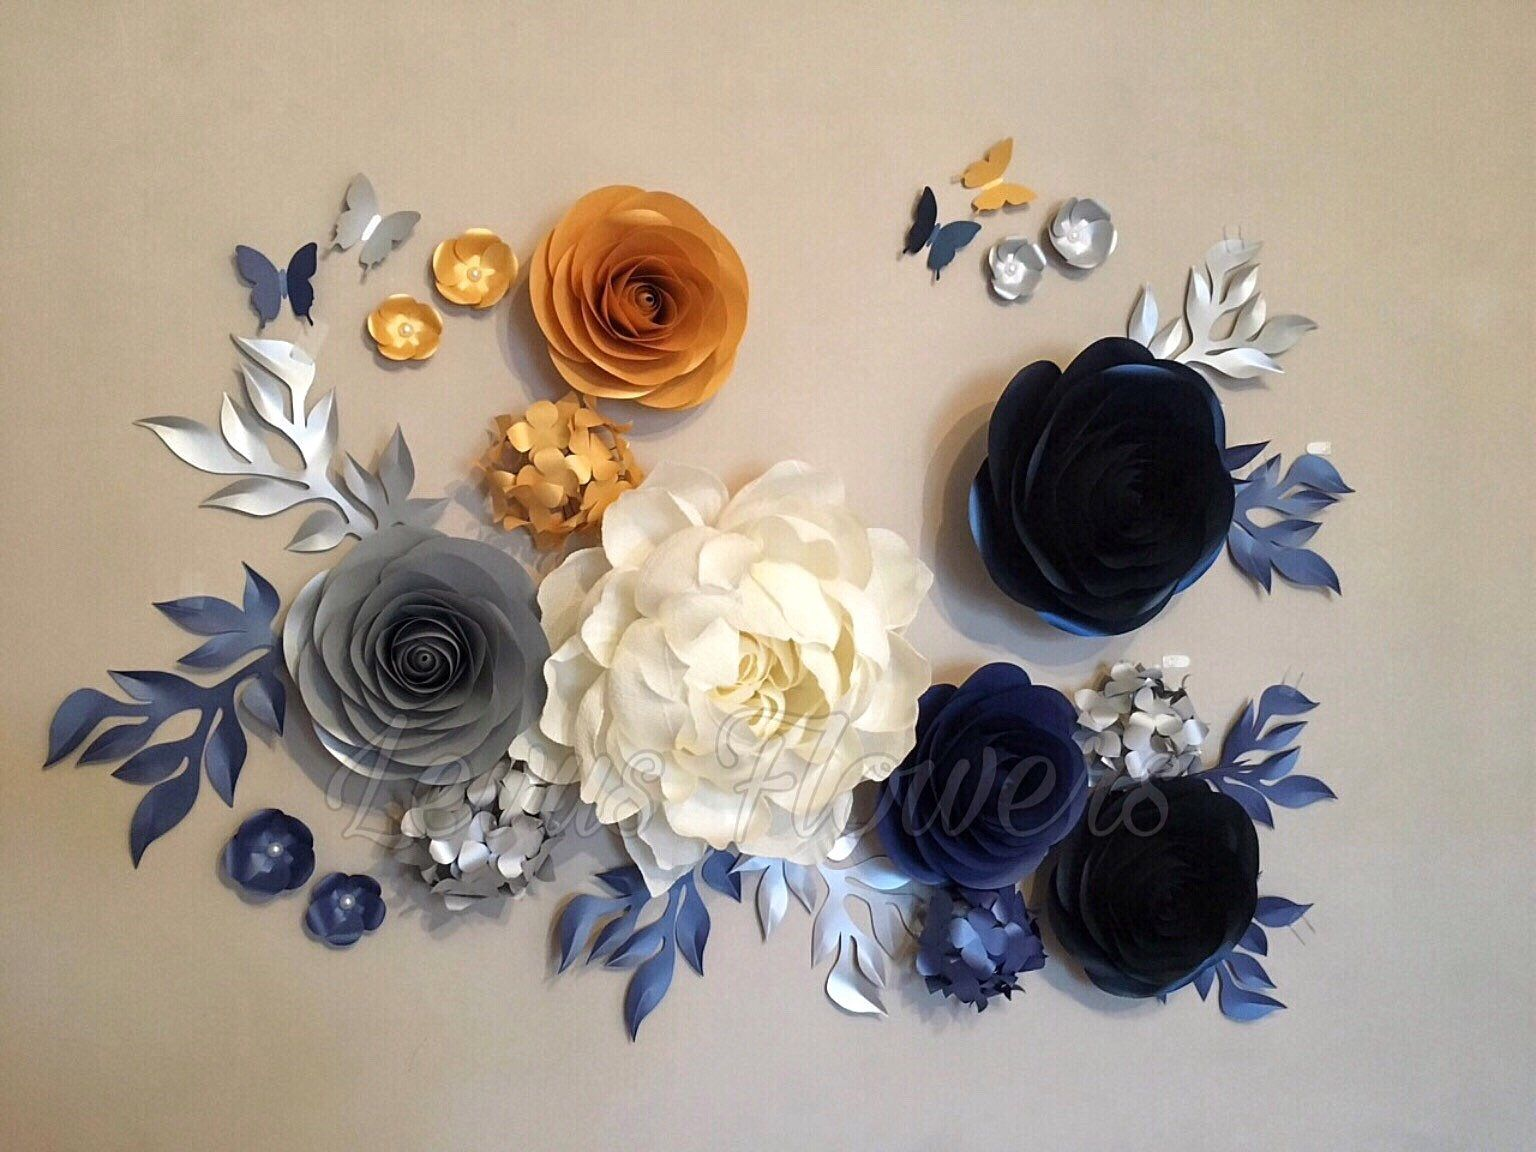 Nursery Flowers DecorationSet Paper FlowersLarge Paper Flowers